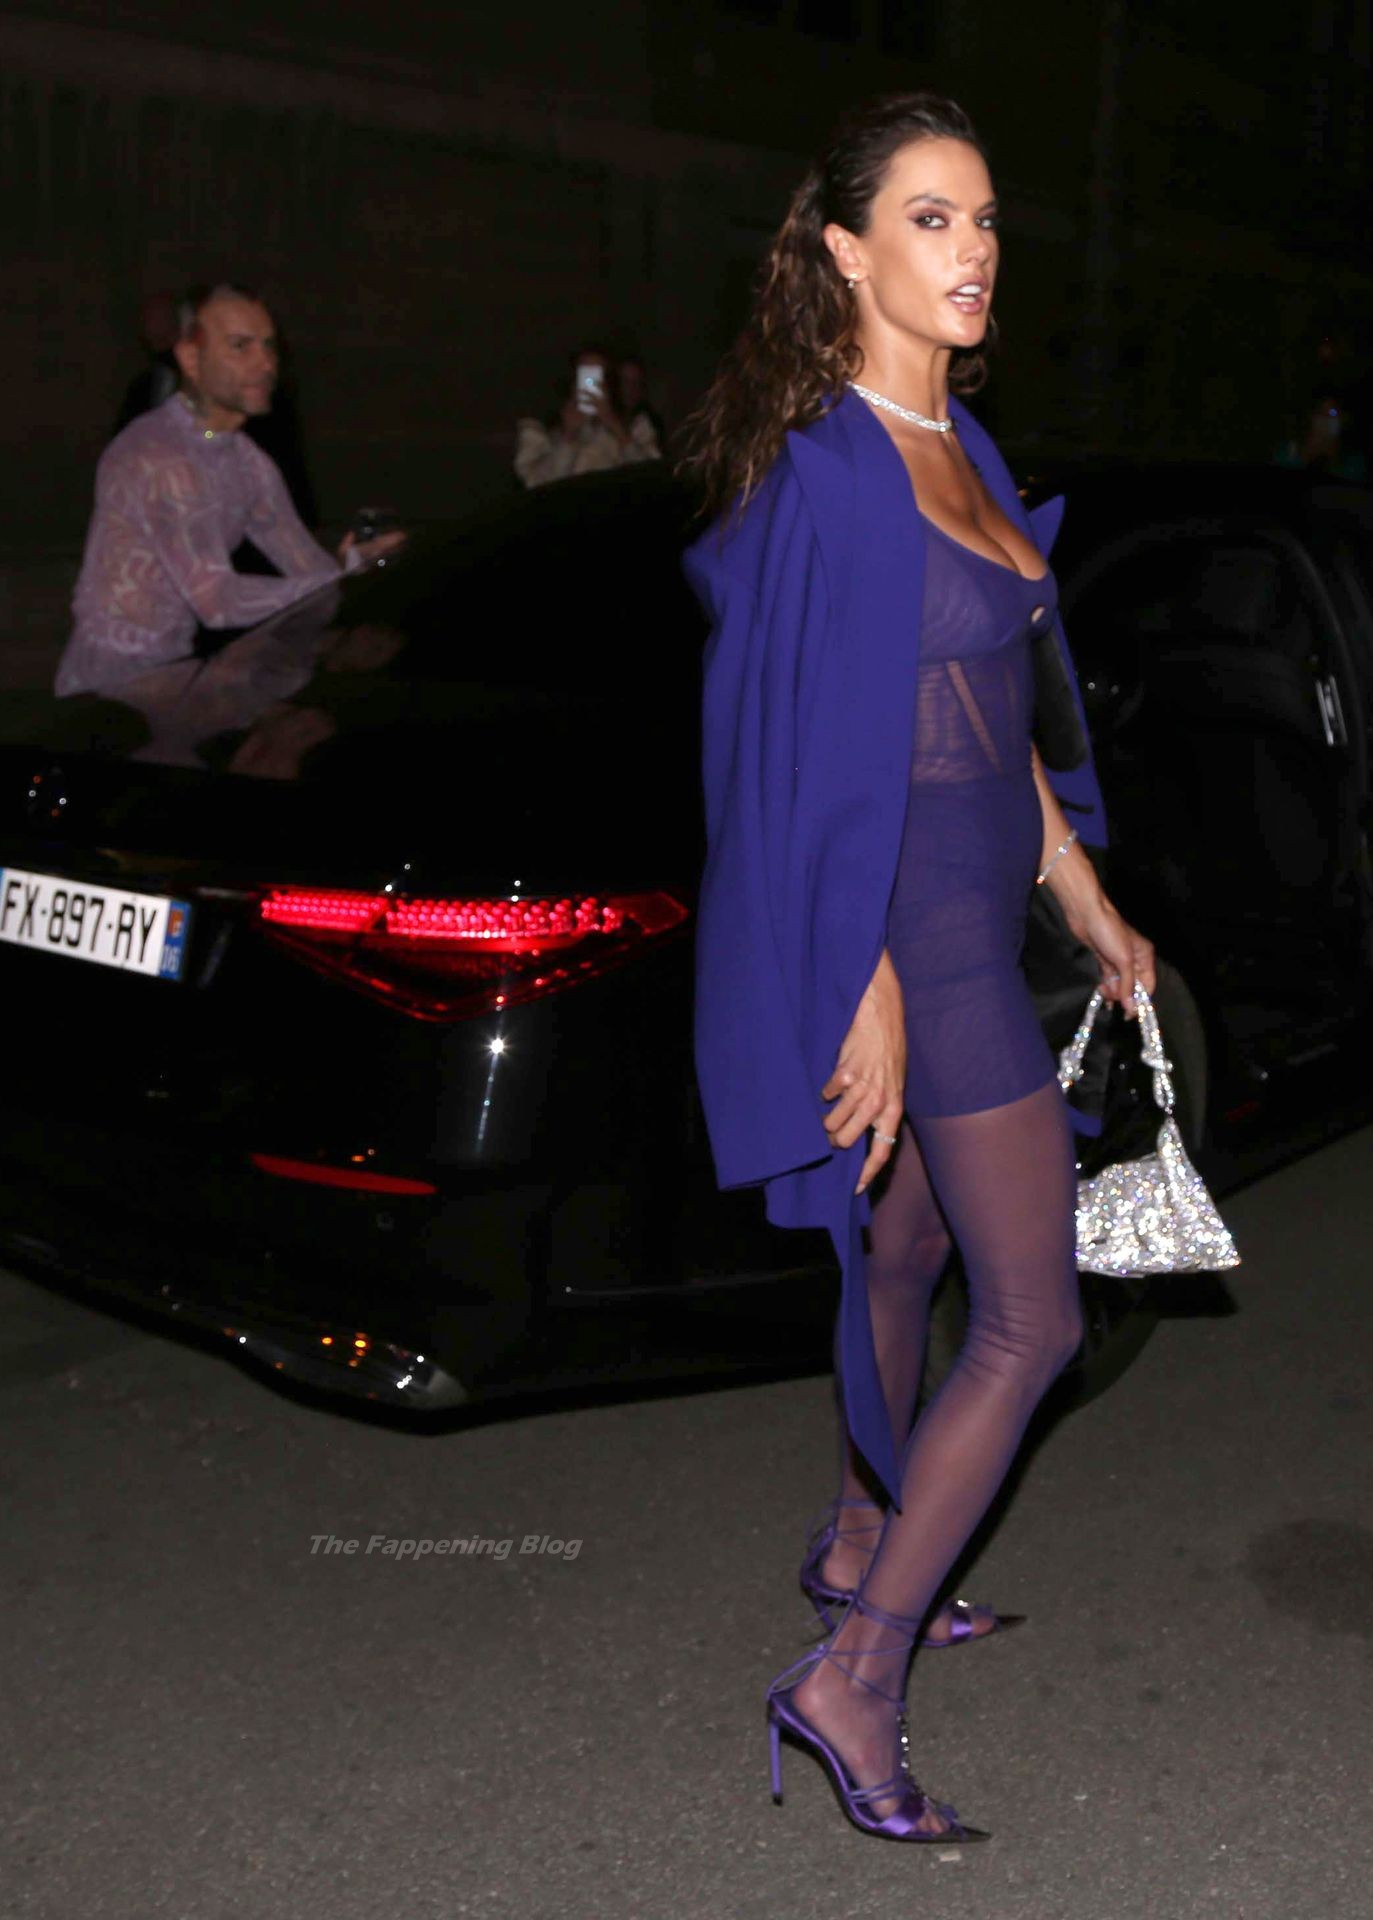 Alessandra-Ambrosio-Sexy-The-Fappening-Blog-93-1.jpg